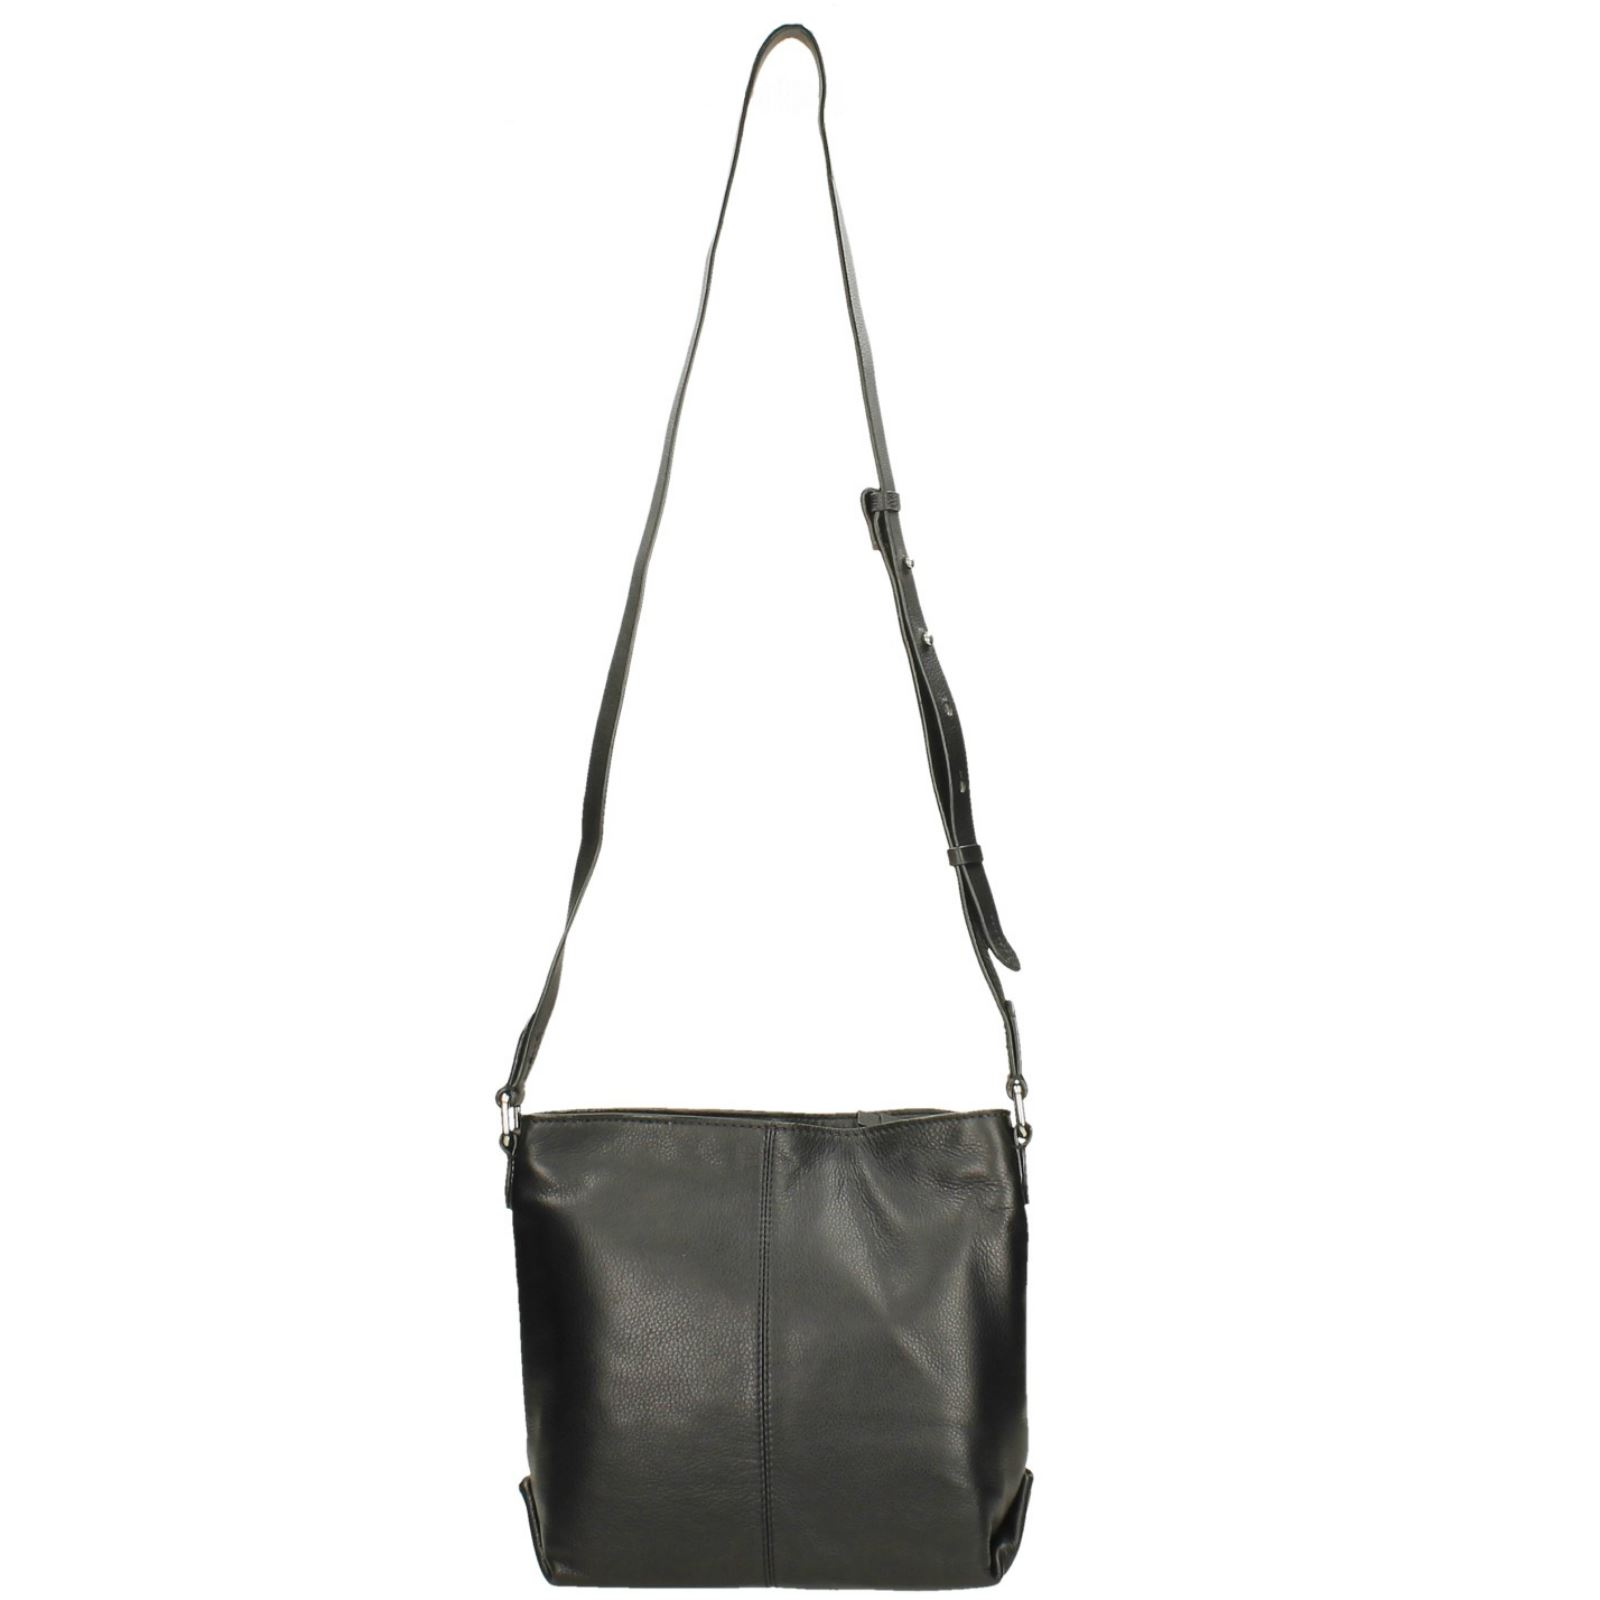 a6bdd80a099 Ladies-Clarks-Crossbody-Bag-Topsham-Charm thumbnail 9